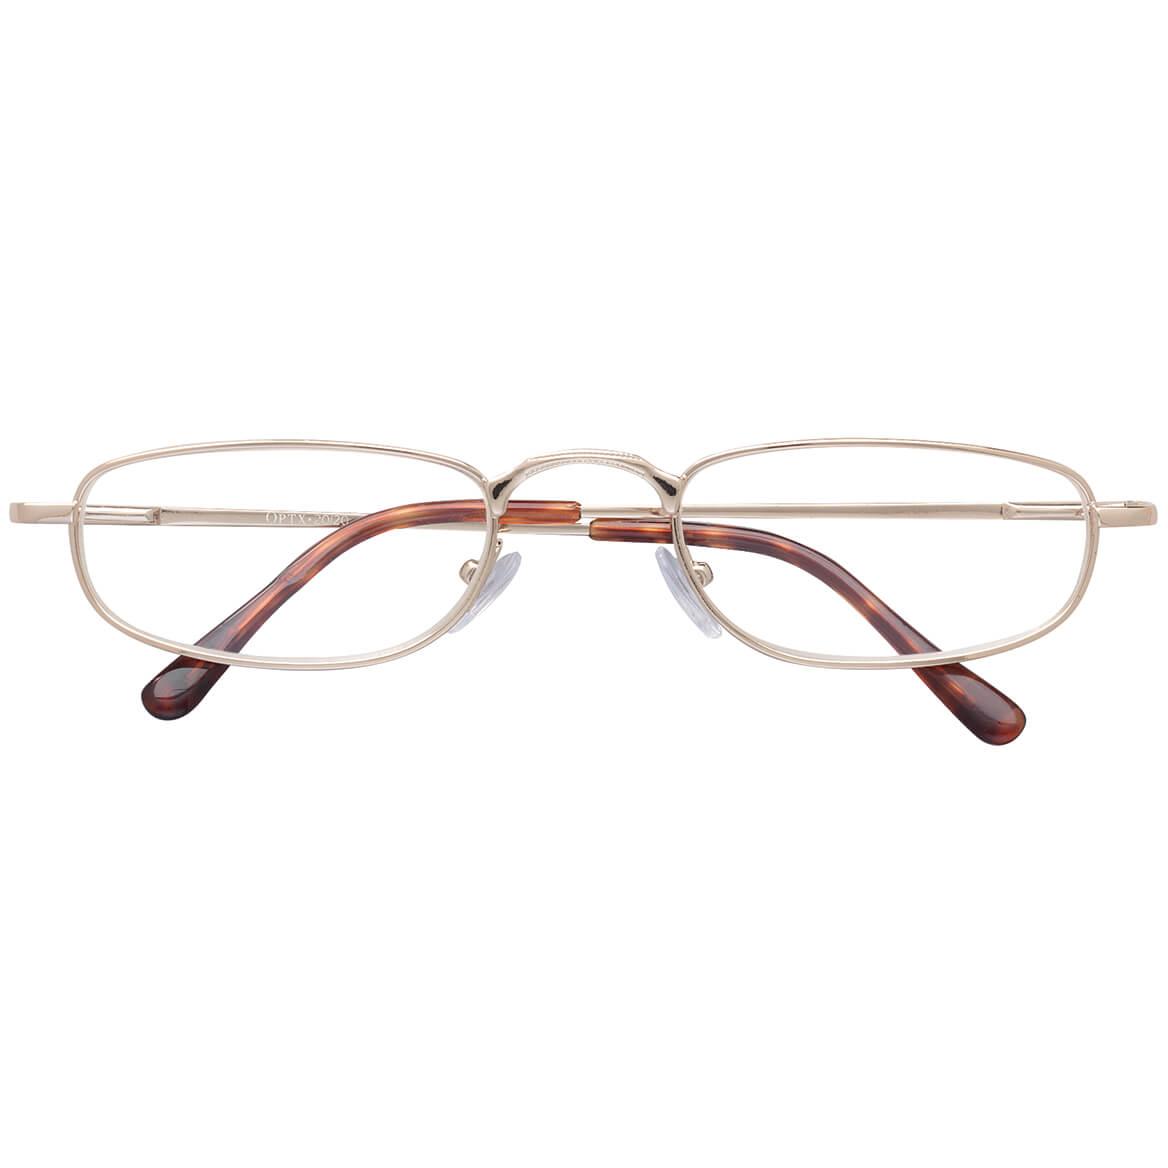 Spring Hinge Reading Glasses - Set of 3-337761